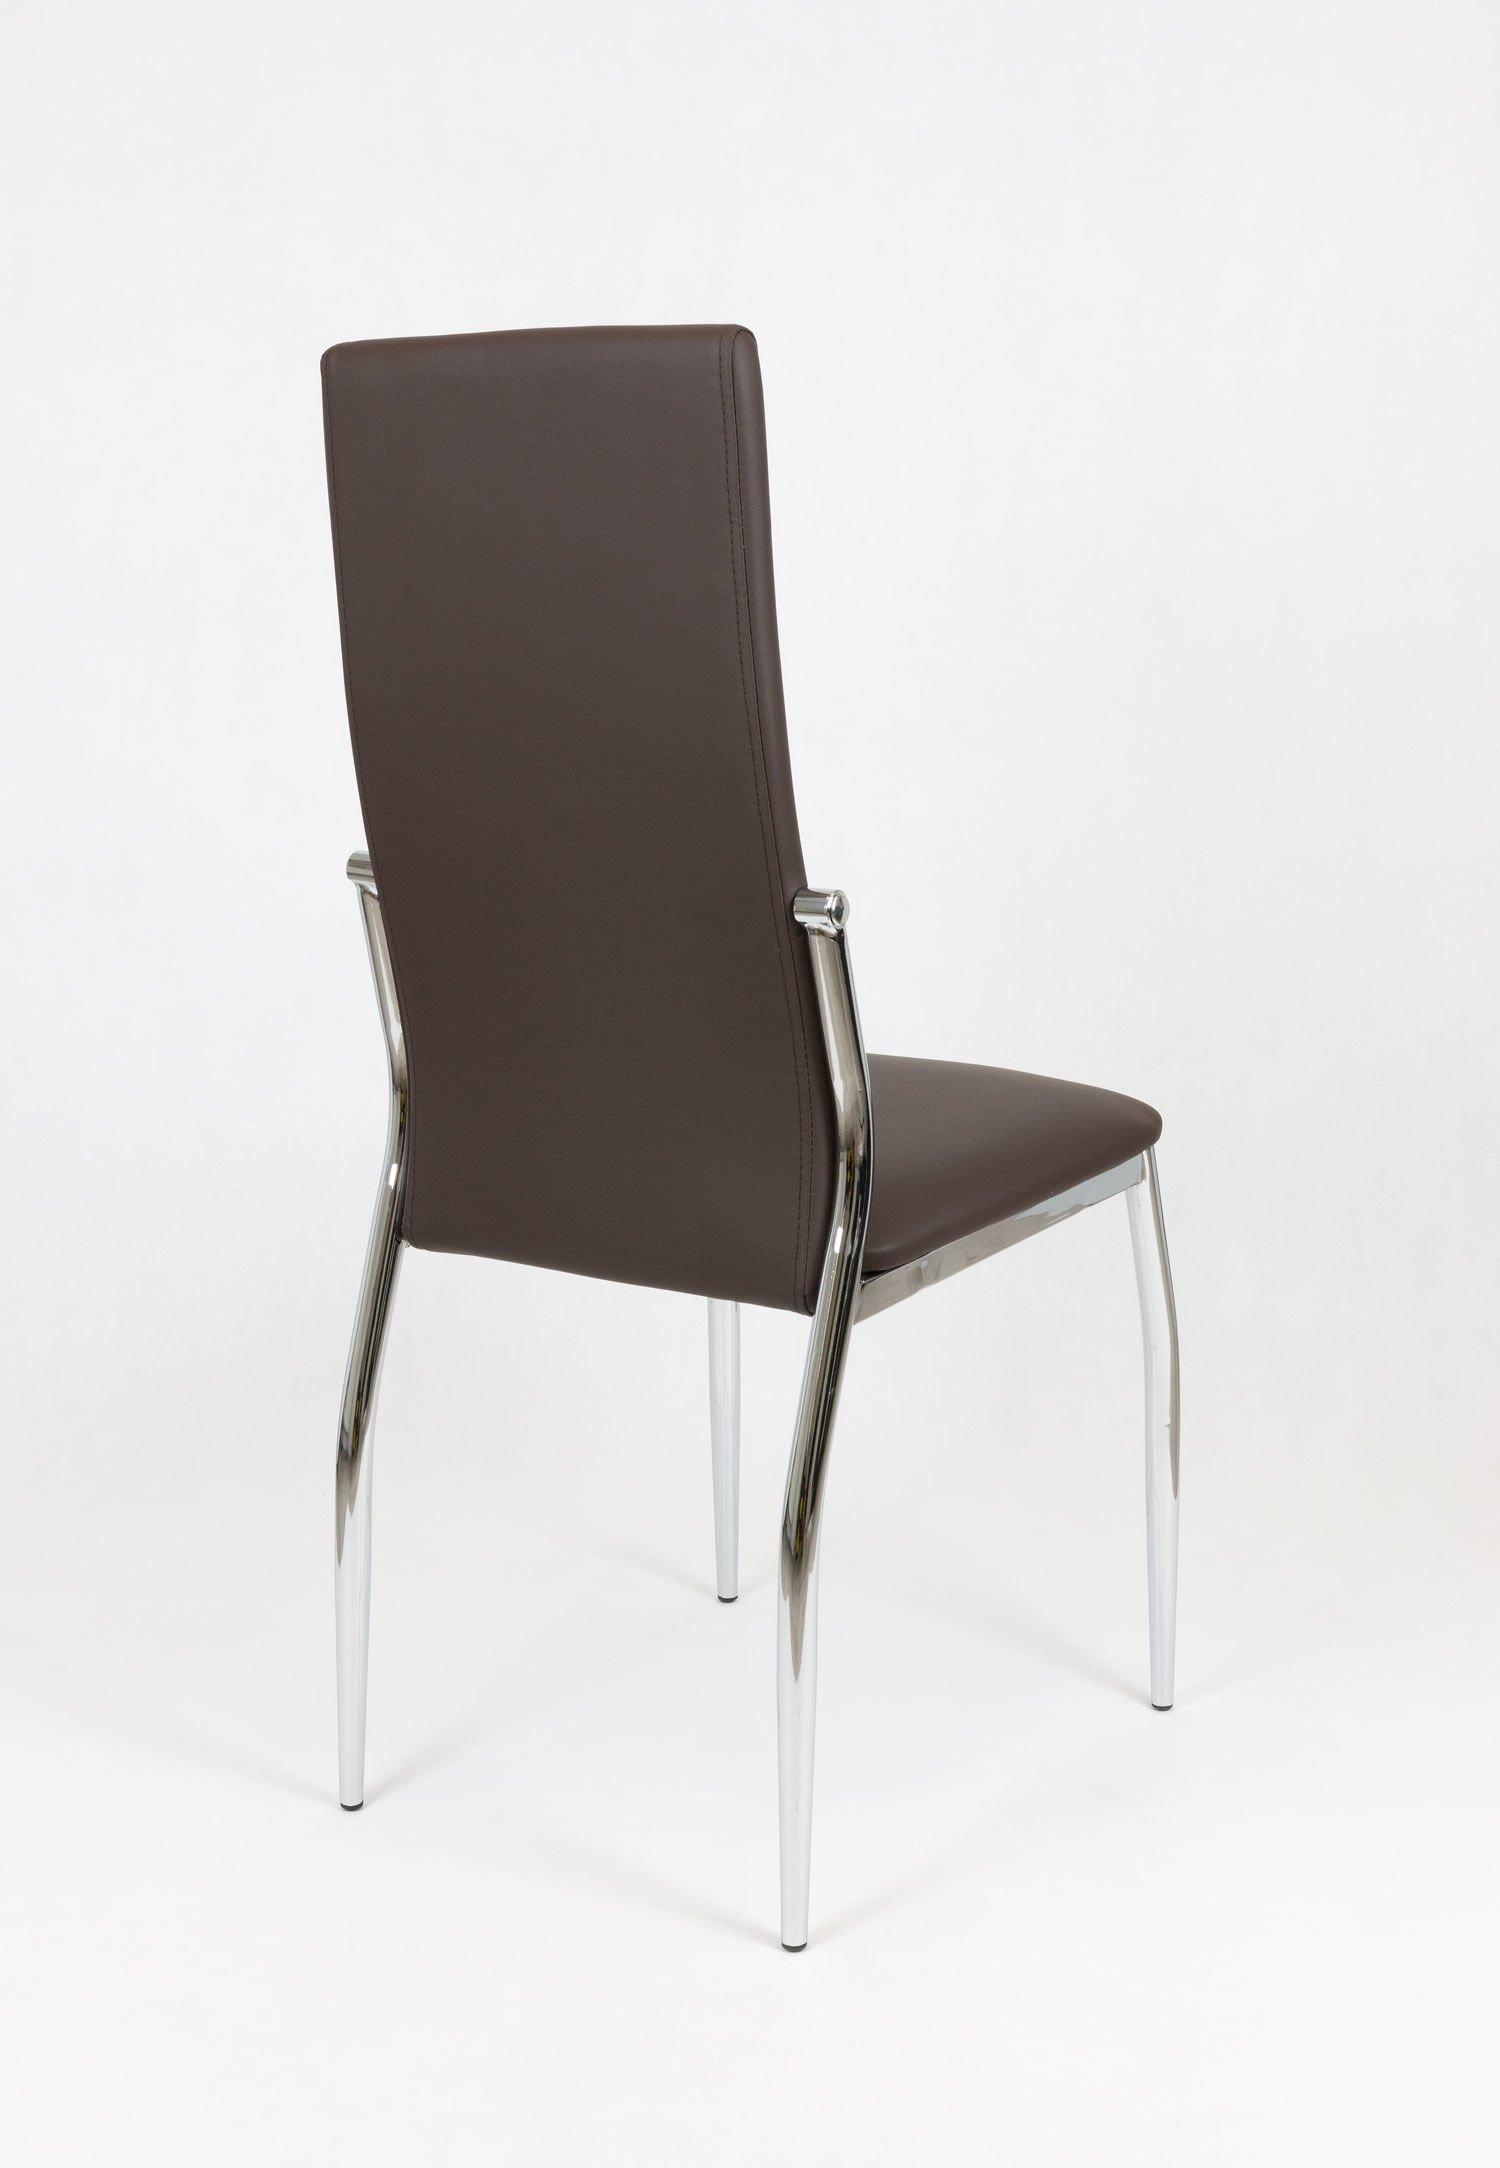 sk design ks004 braun grau kunsleder stuhl mit chromgestell braun sonderangebote angebot. Black Bedroom Furniture Sets. Home Design Ideas